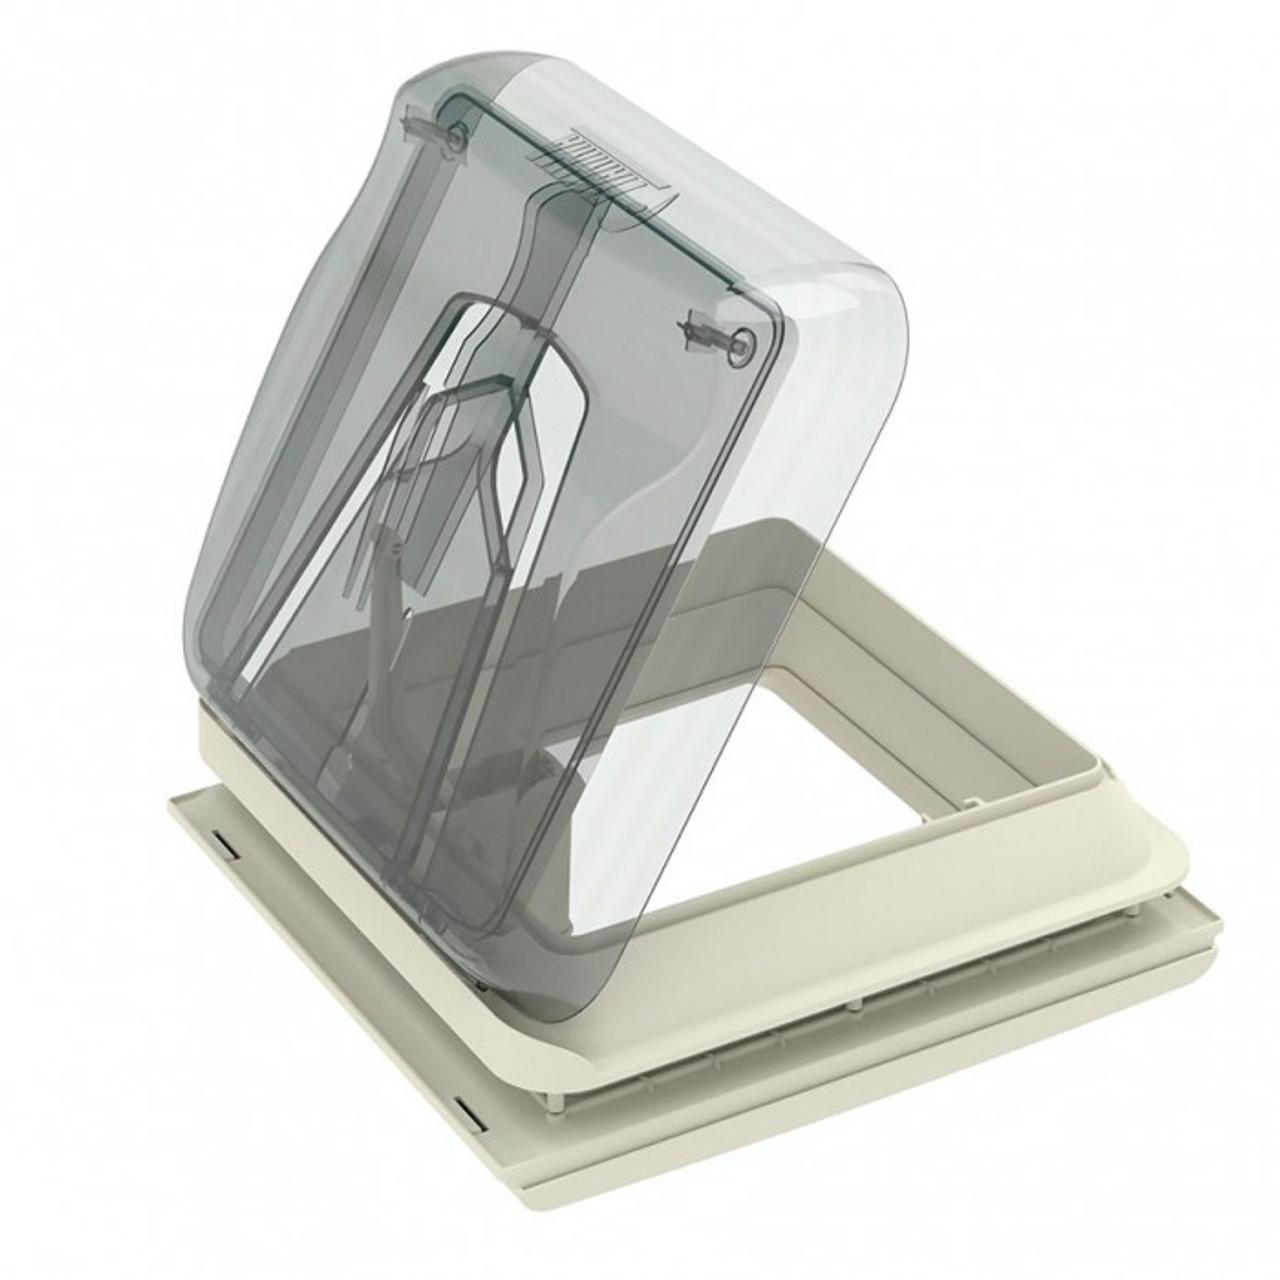 Fiamma hatch 280mm X 280mm Crystal Vent 28 F  Open View